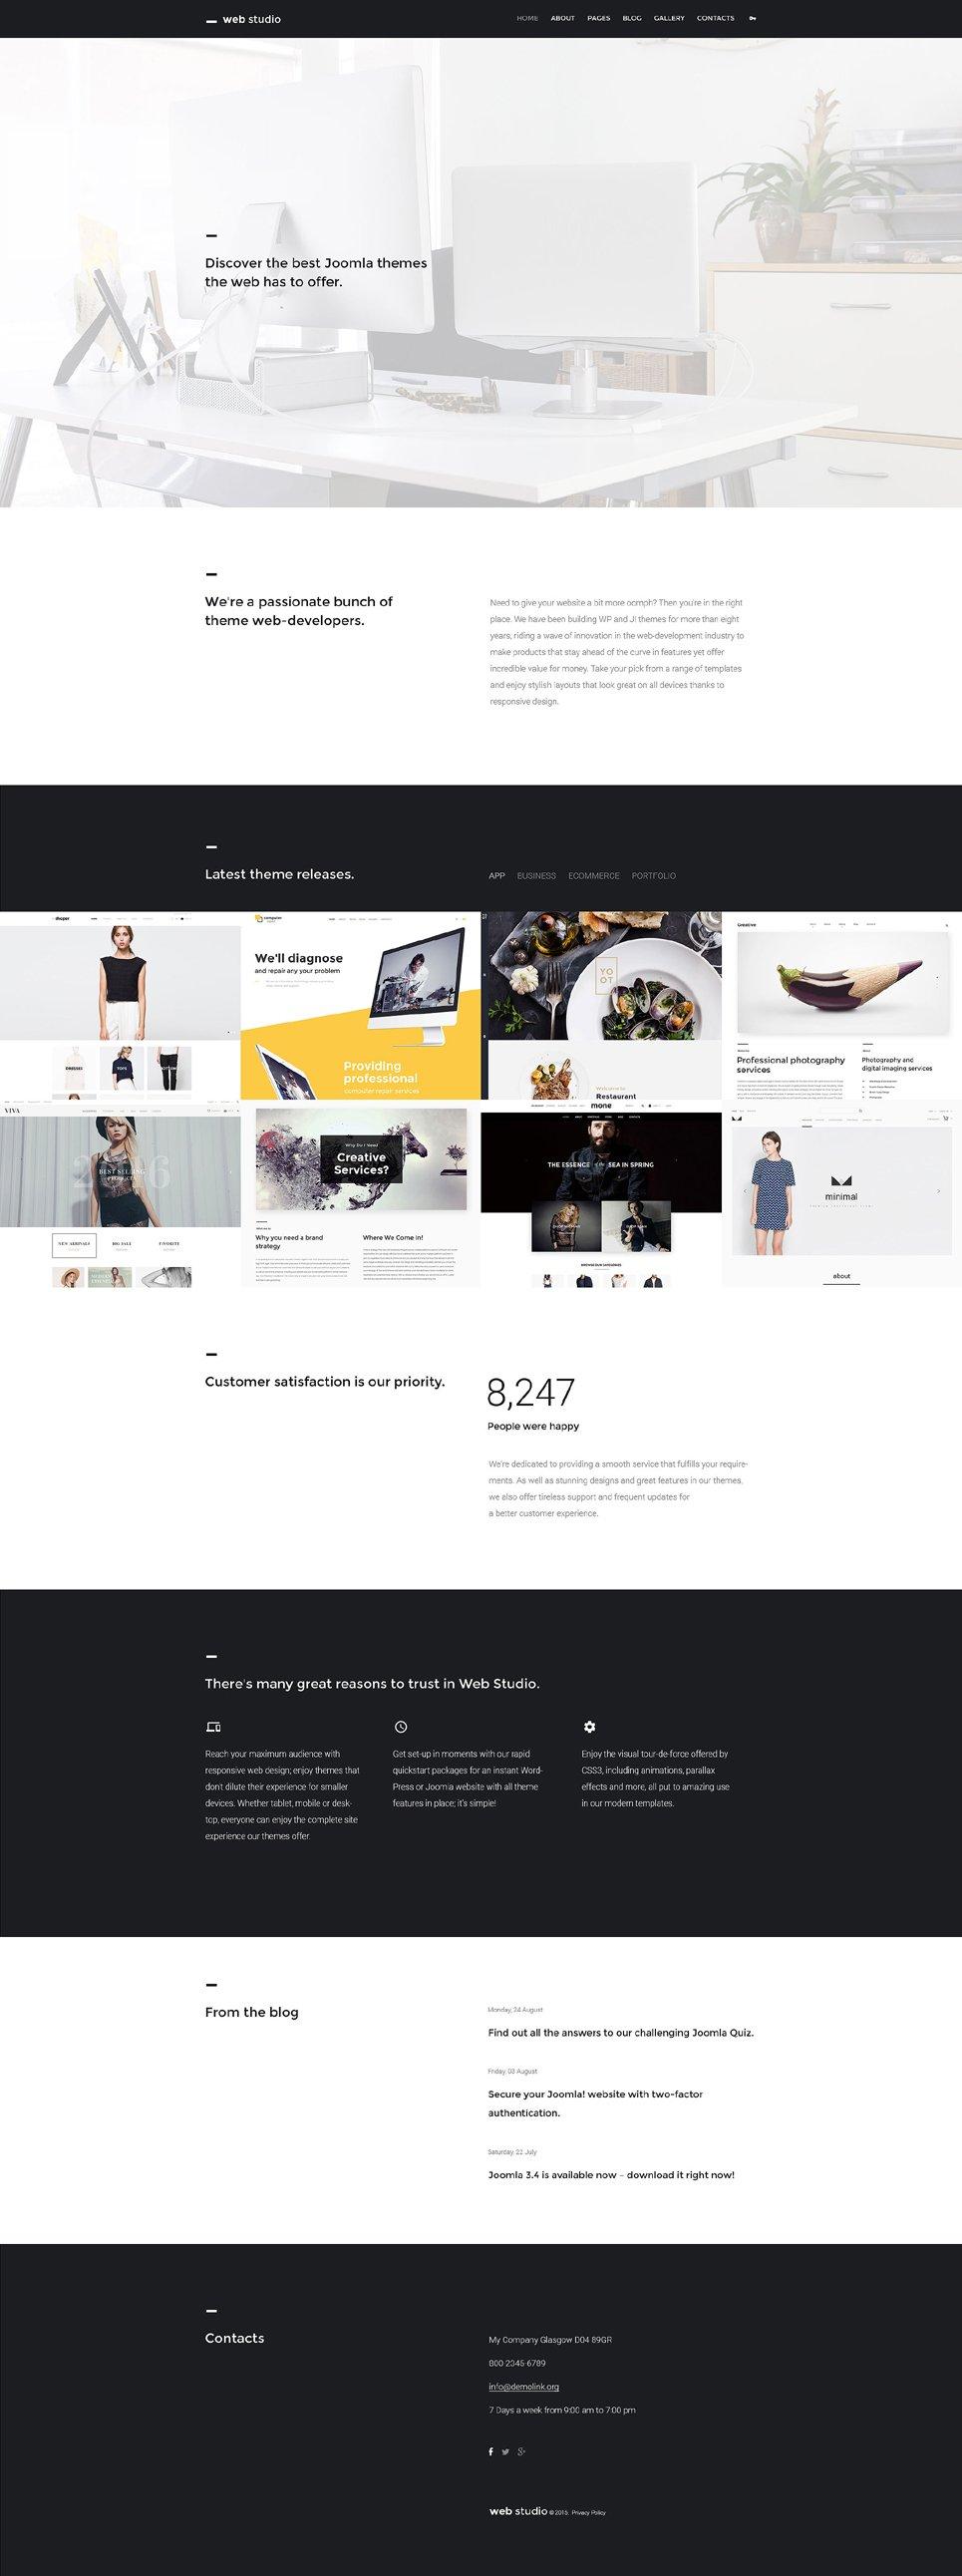 web design joomla theme. Black Bedroom Furniture Sets. Home Design Ideas